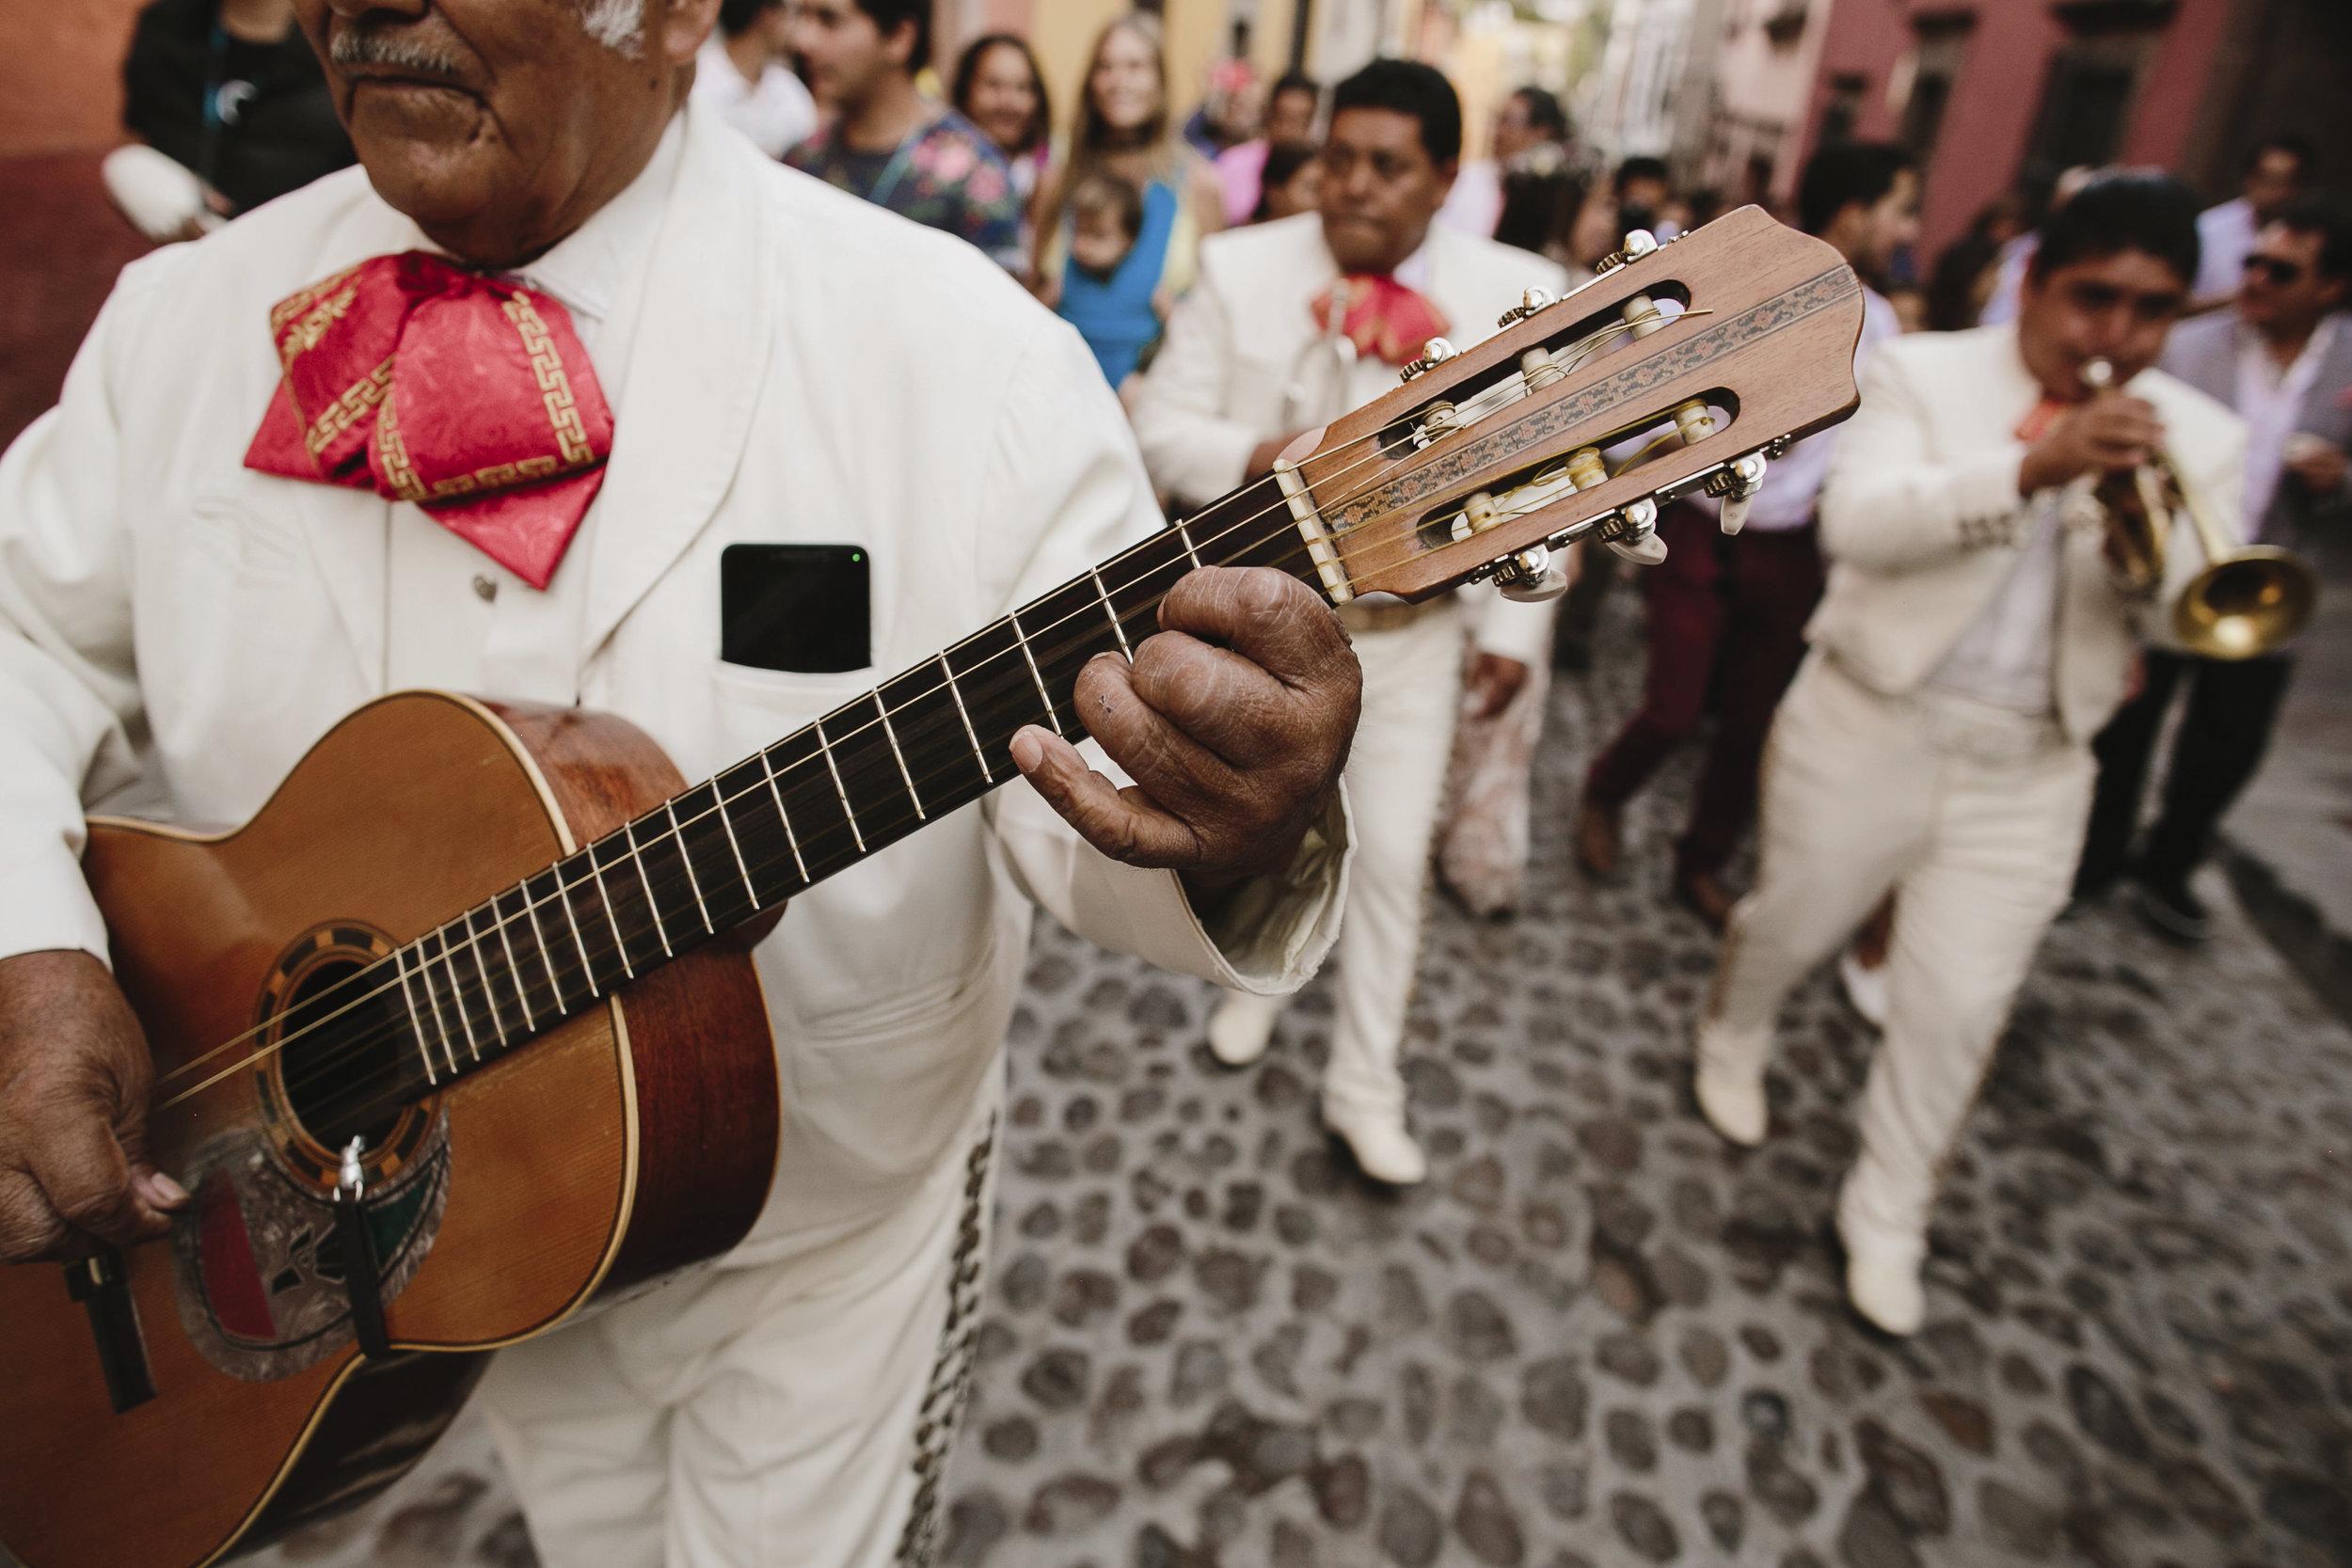 alfons_flores_destination_wedding_photography_mavi_david-379.JPG